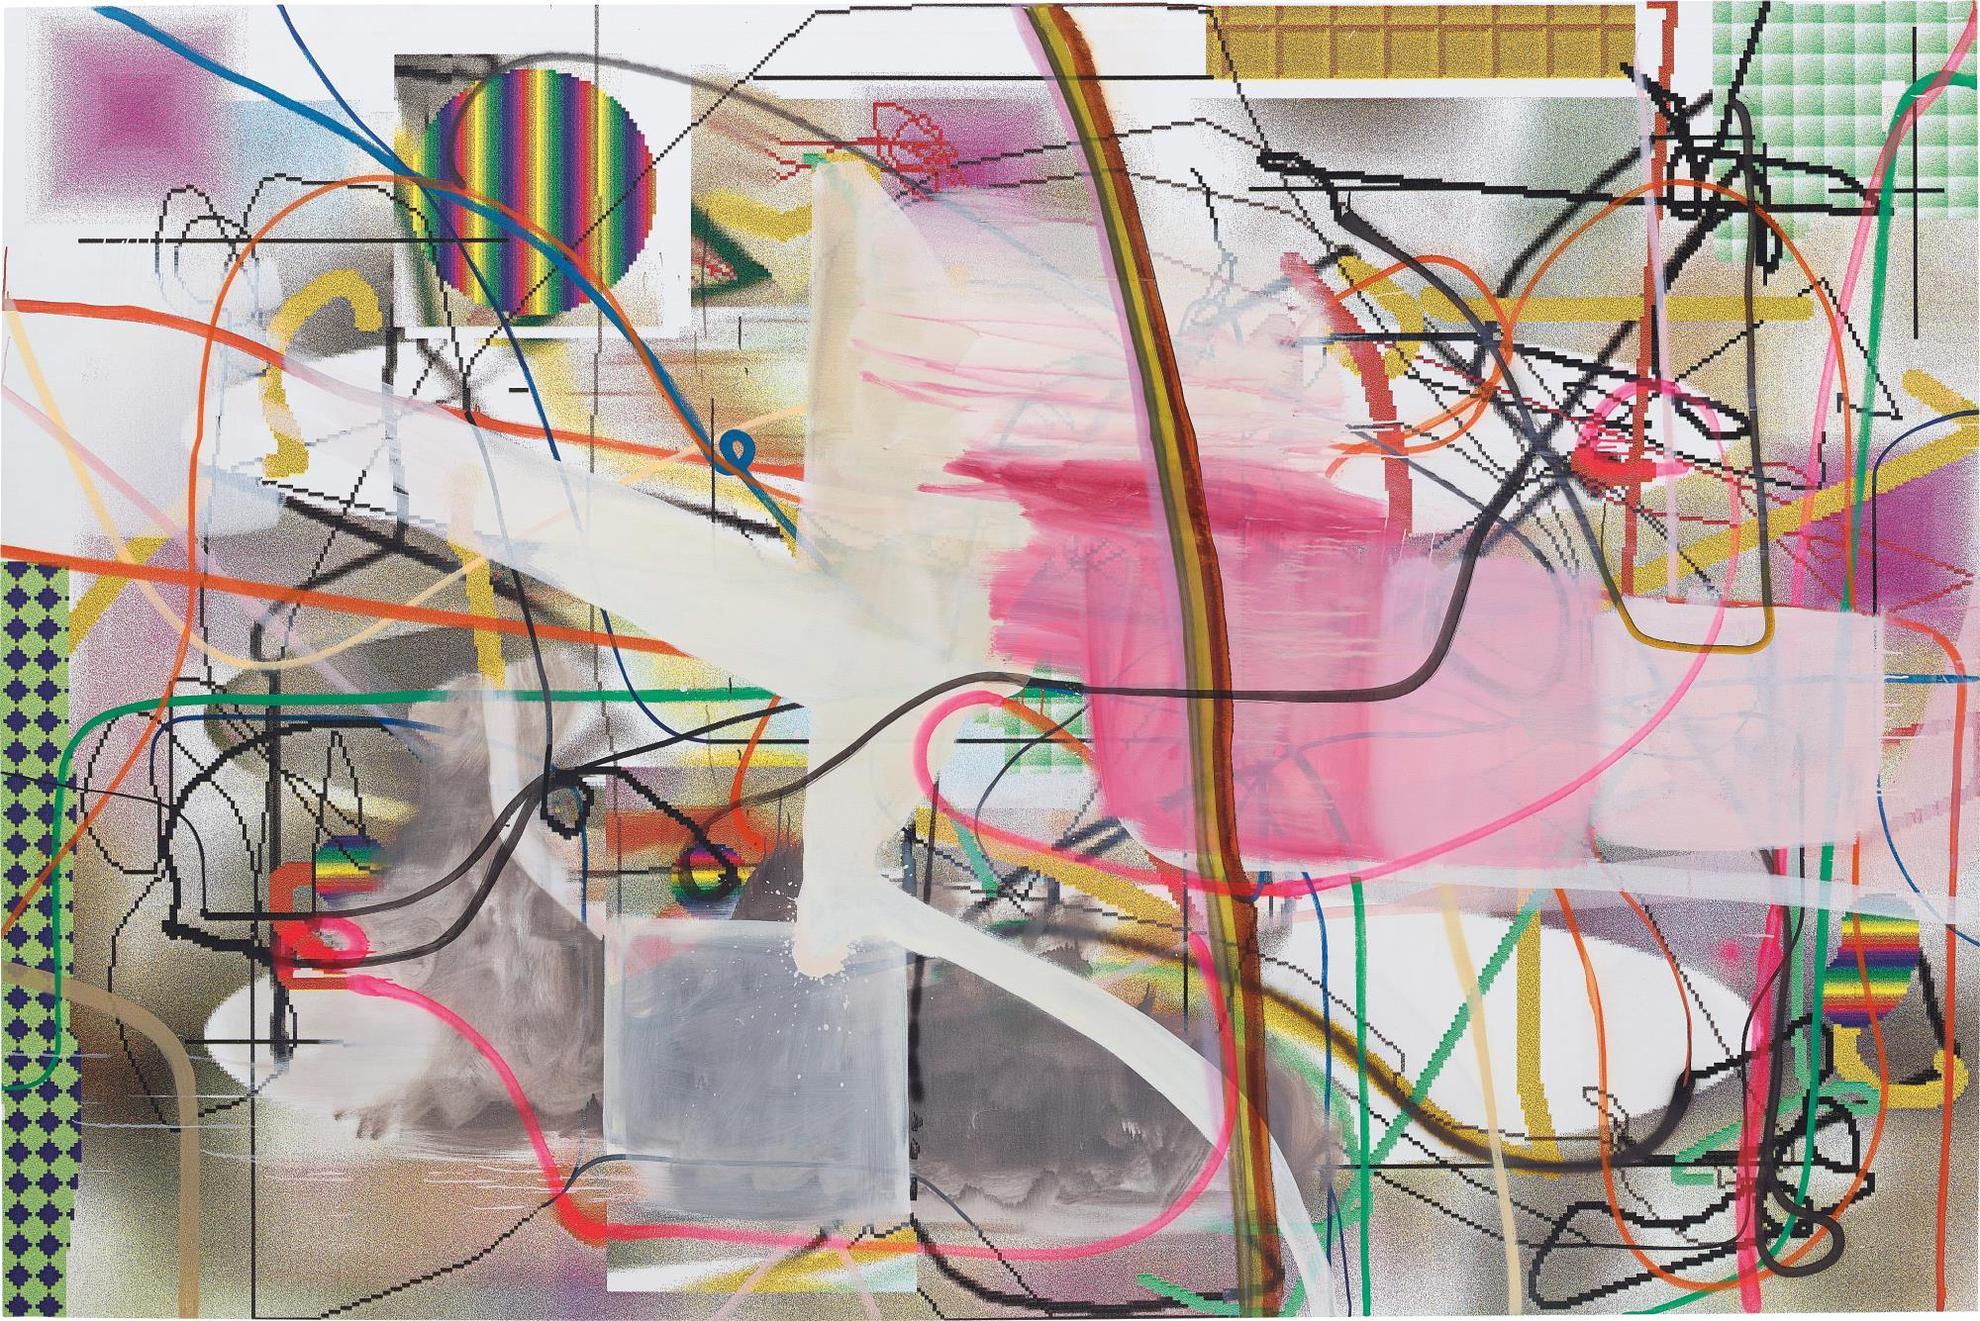 Albert Oehlen-Abyss-1997